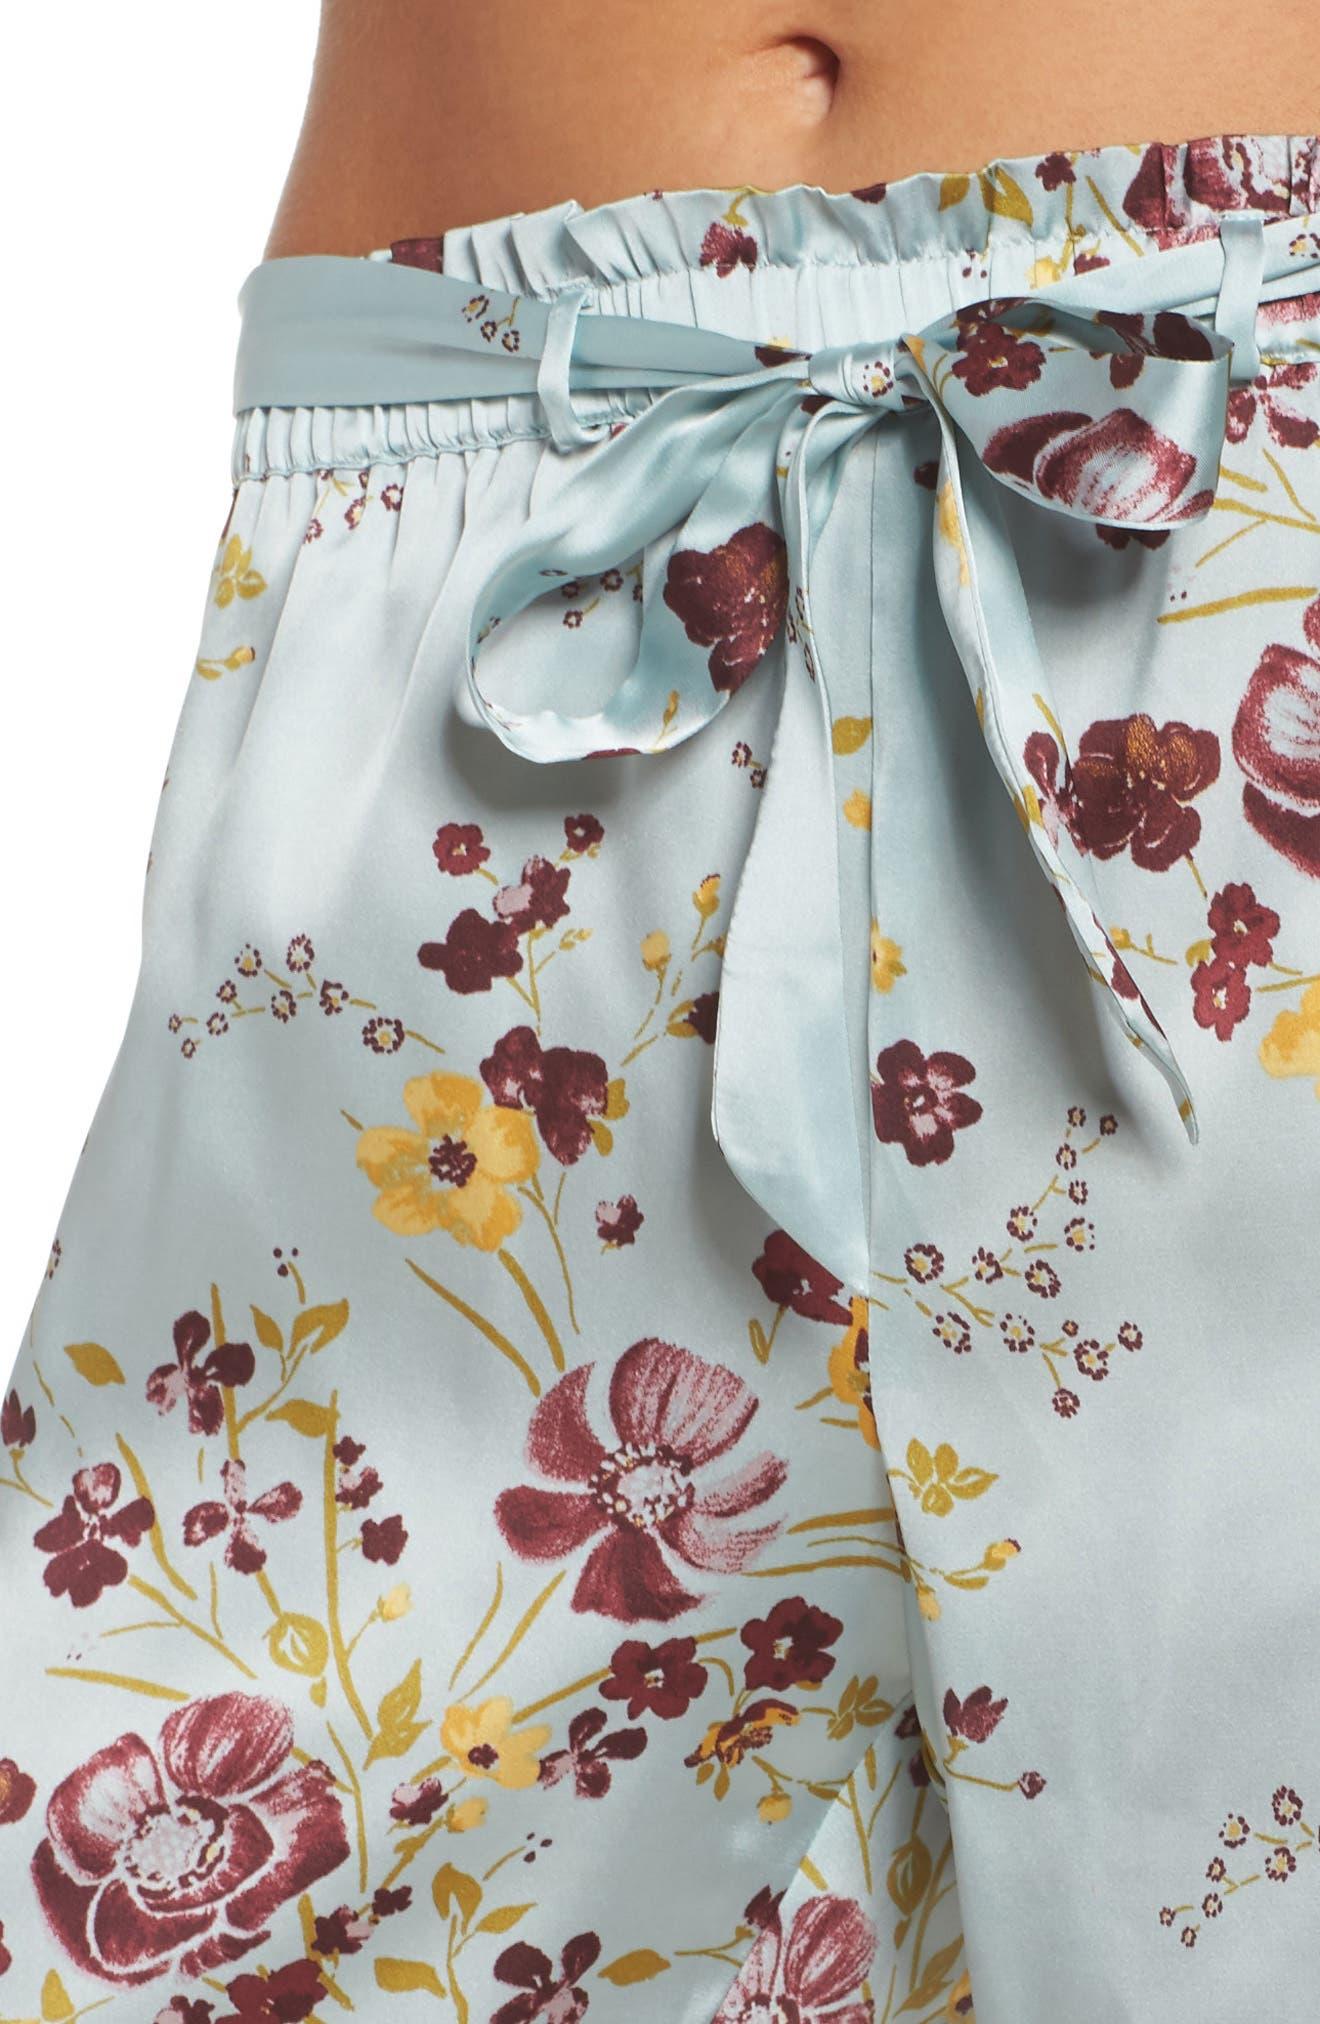 In My Dreams Pajama Pants,                             Alternate thumbnail 6, color,                             Blue Cloud Pretty Floral